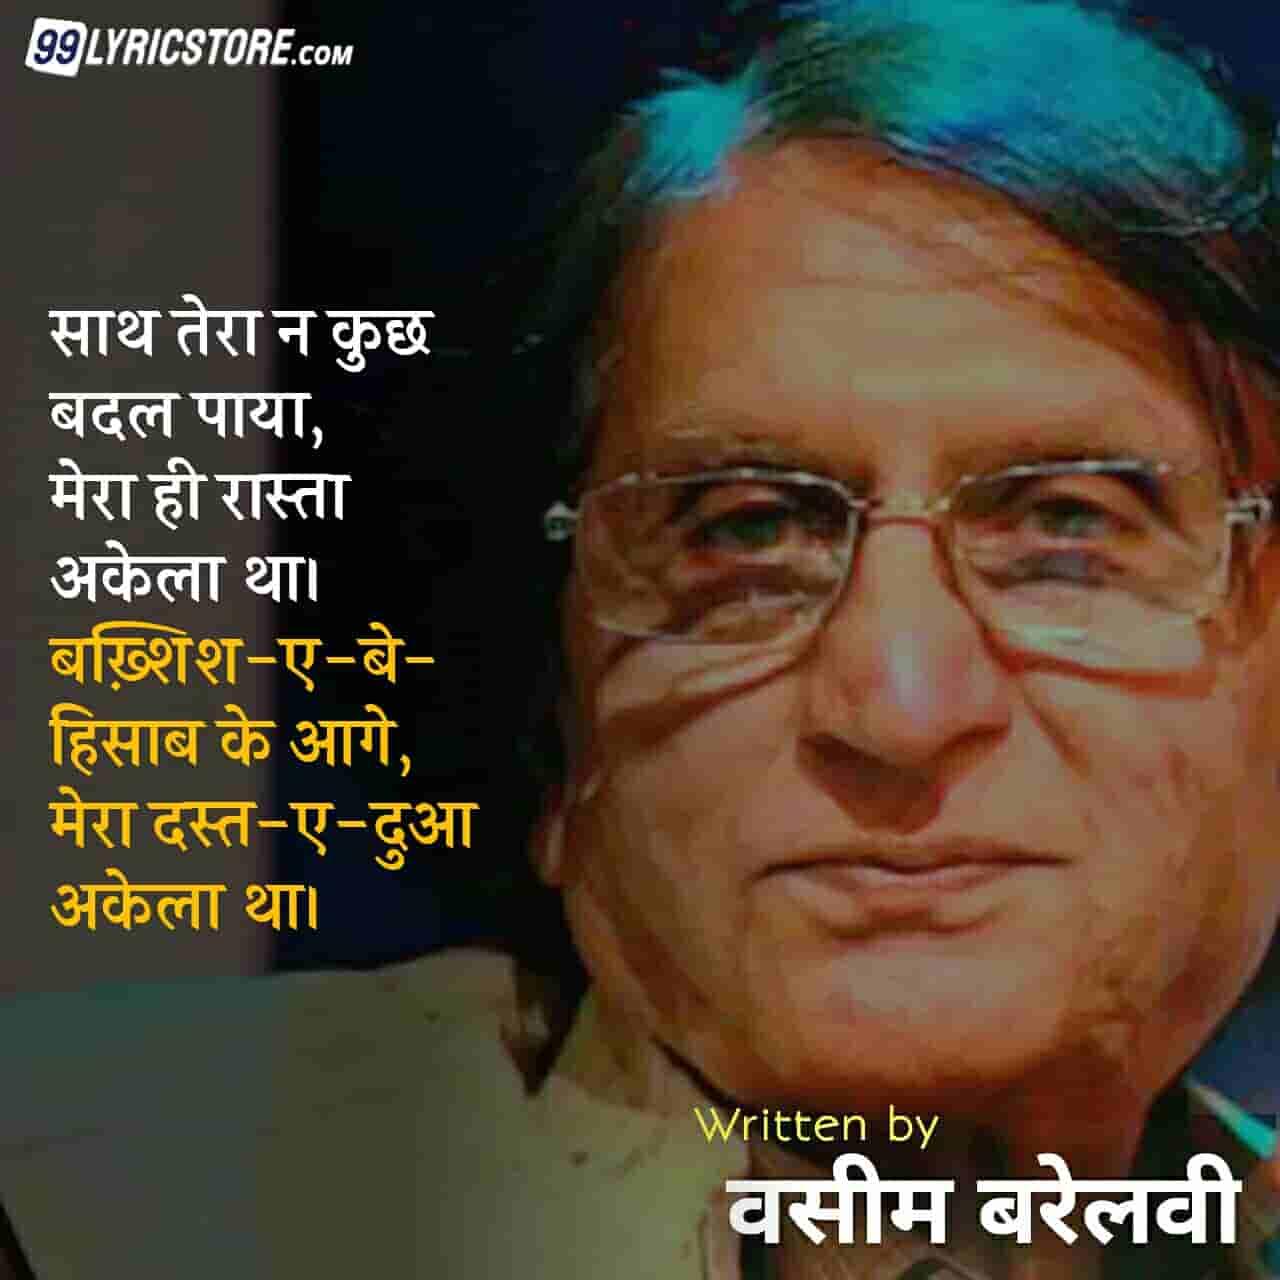 This beautiful Ghazal 'Apne Andaaz Ka Akela Tha' has written by Waseem Barelvi.